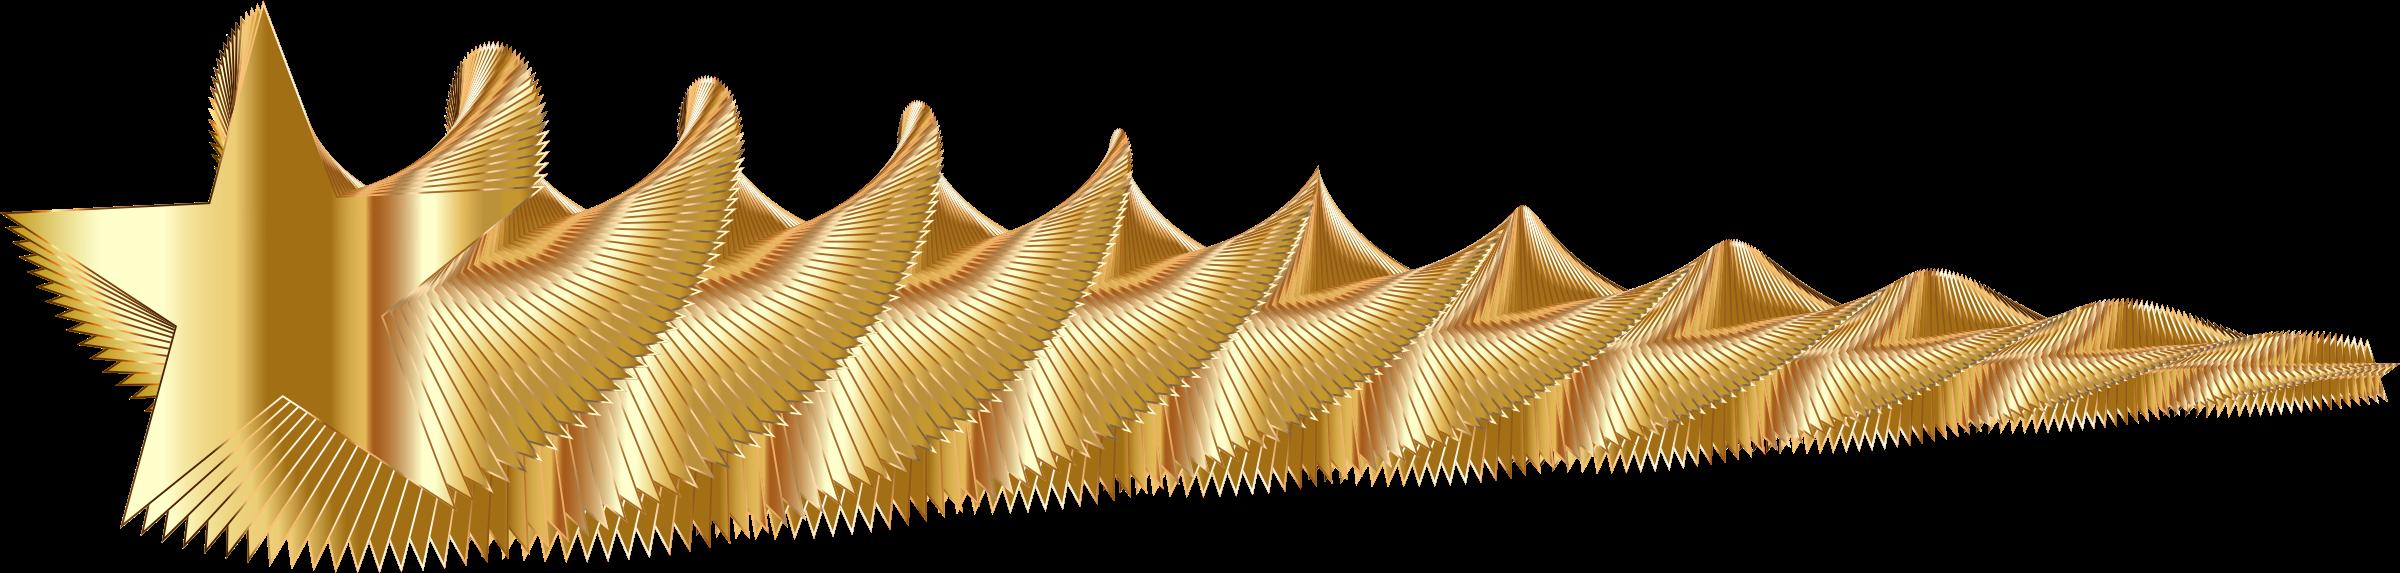 Gold shooting star clipart jpg transparent download Clipart - Golden Shooting Star jpg transparent download